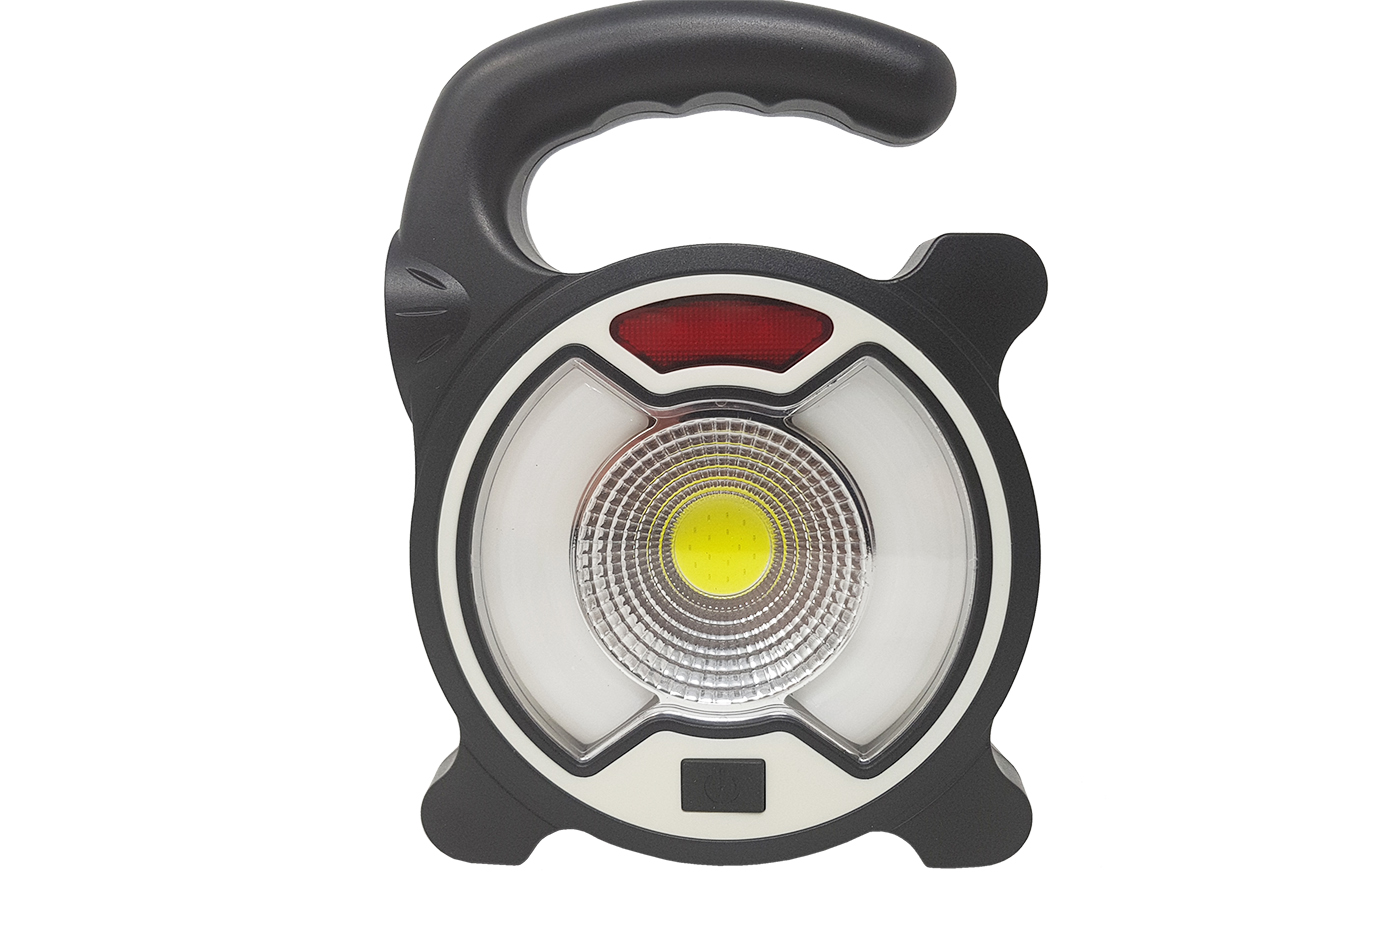 Bes 23633 lampade emergenza beselettronica lampada emergenza